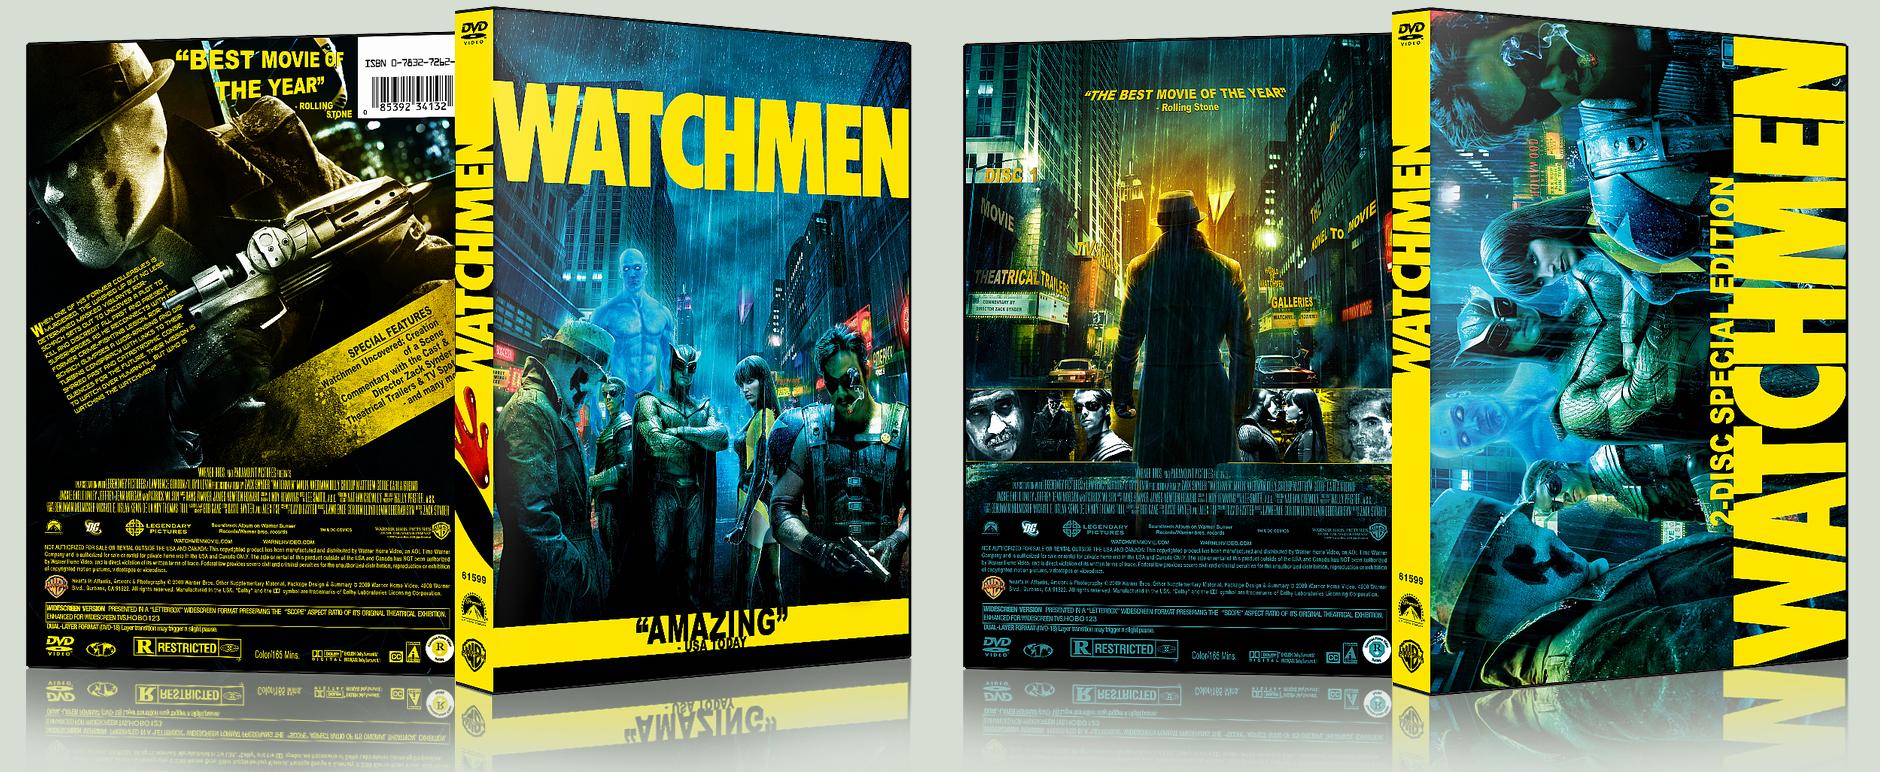 Watchmen DVD Covers by hobo95 on DeviantArt